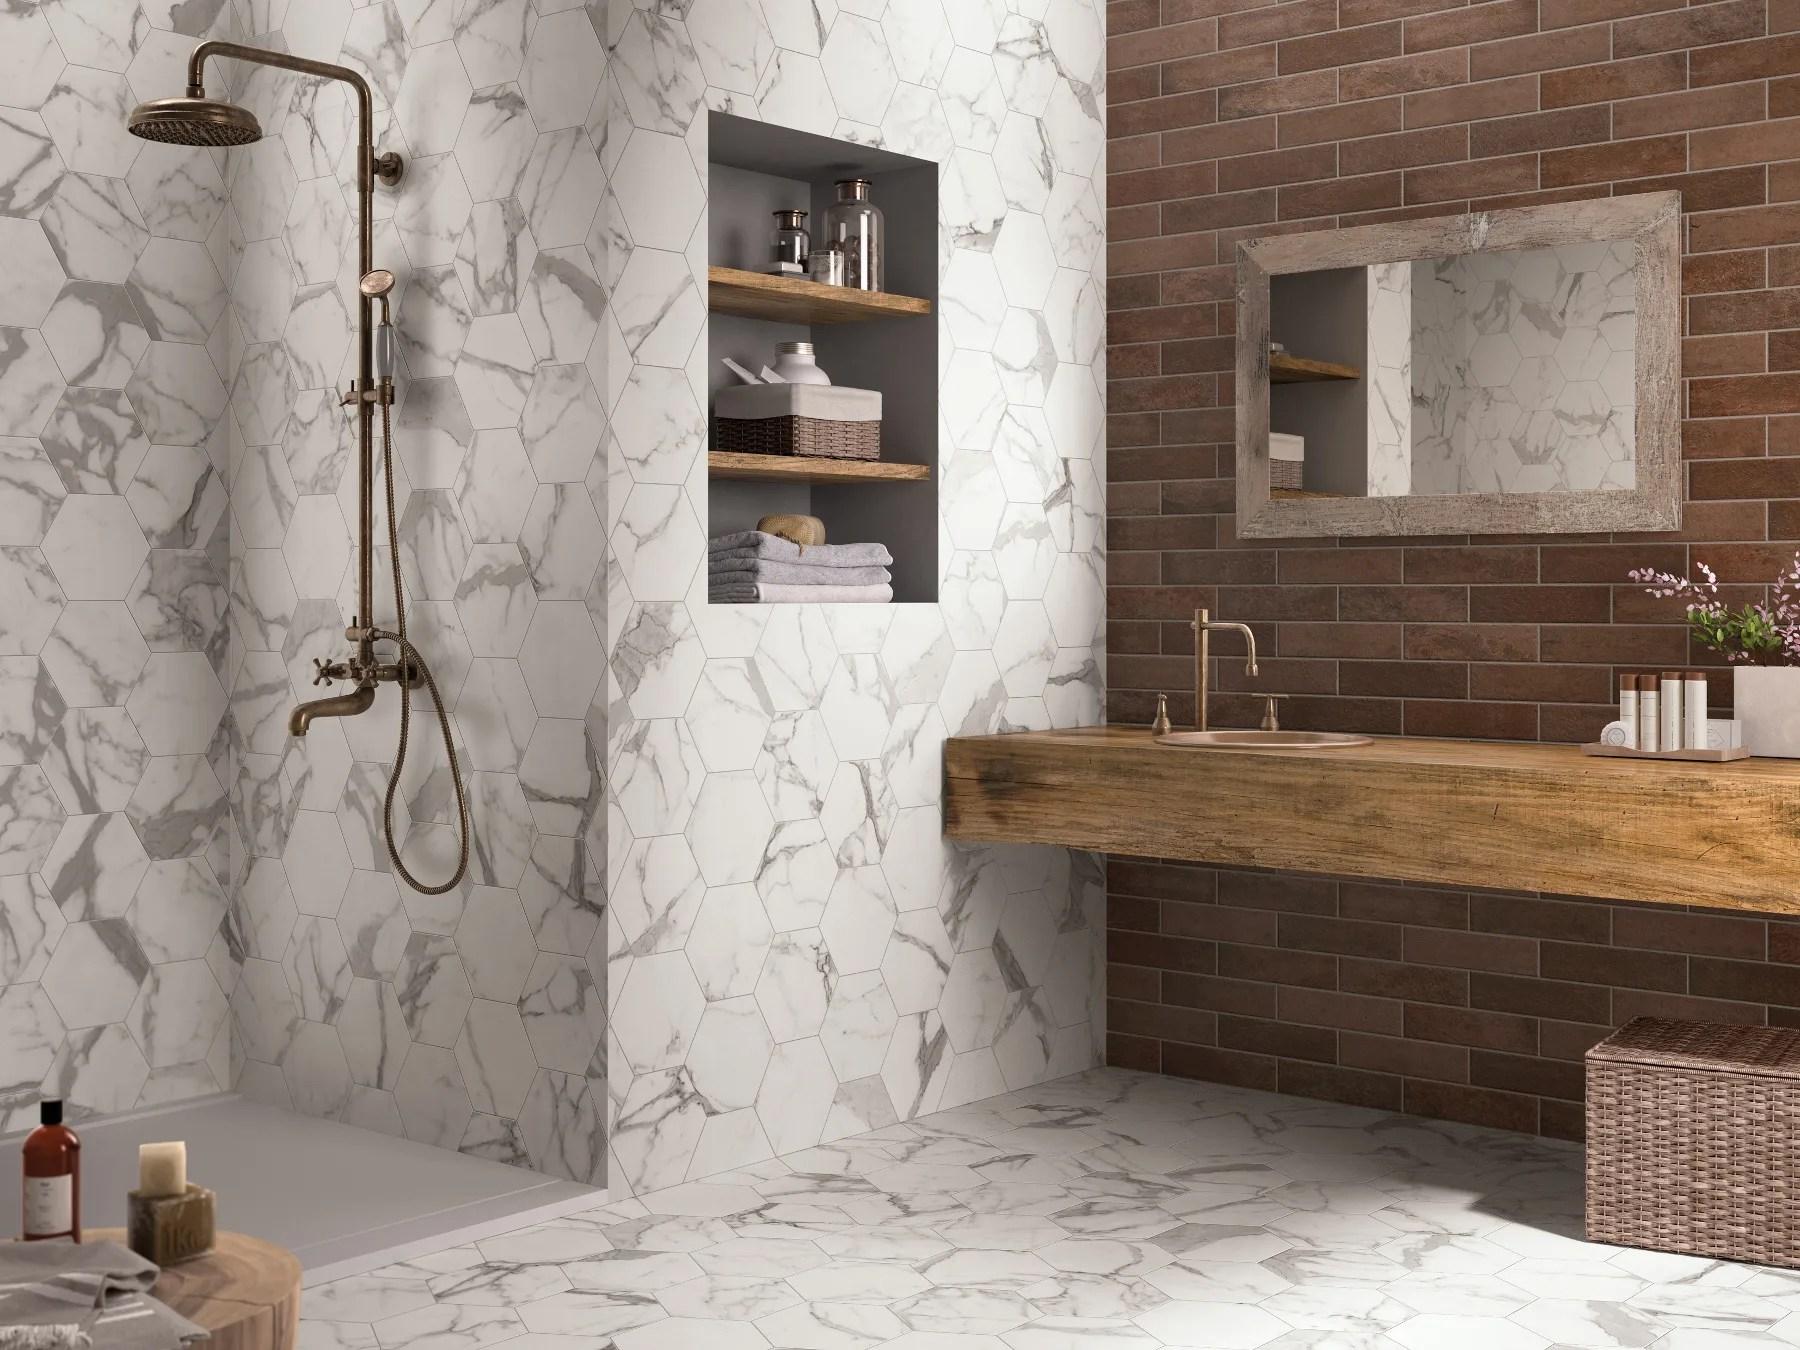 Rivestimento bagno piastrelle esagonali piastrelle esagonali